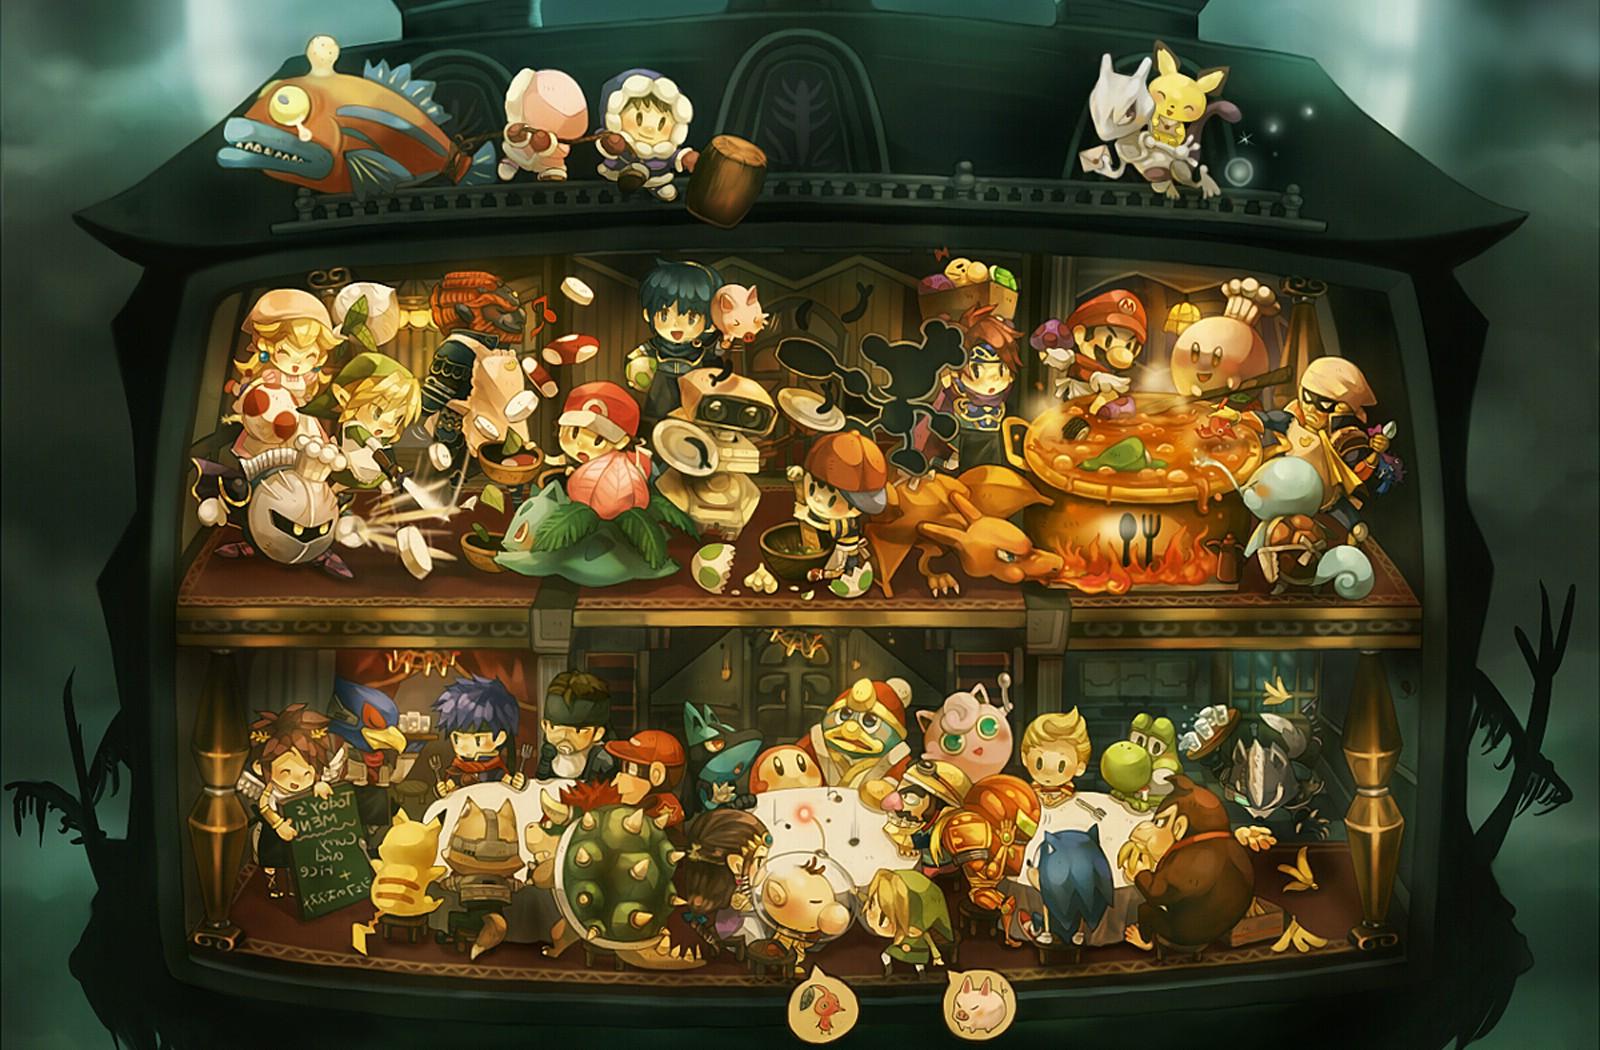 Wallpaper 1600x1050 Px Nintendo Video Games 1600x1050 Wallhaven 1082445 Hd Wallpapers Wallhere